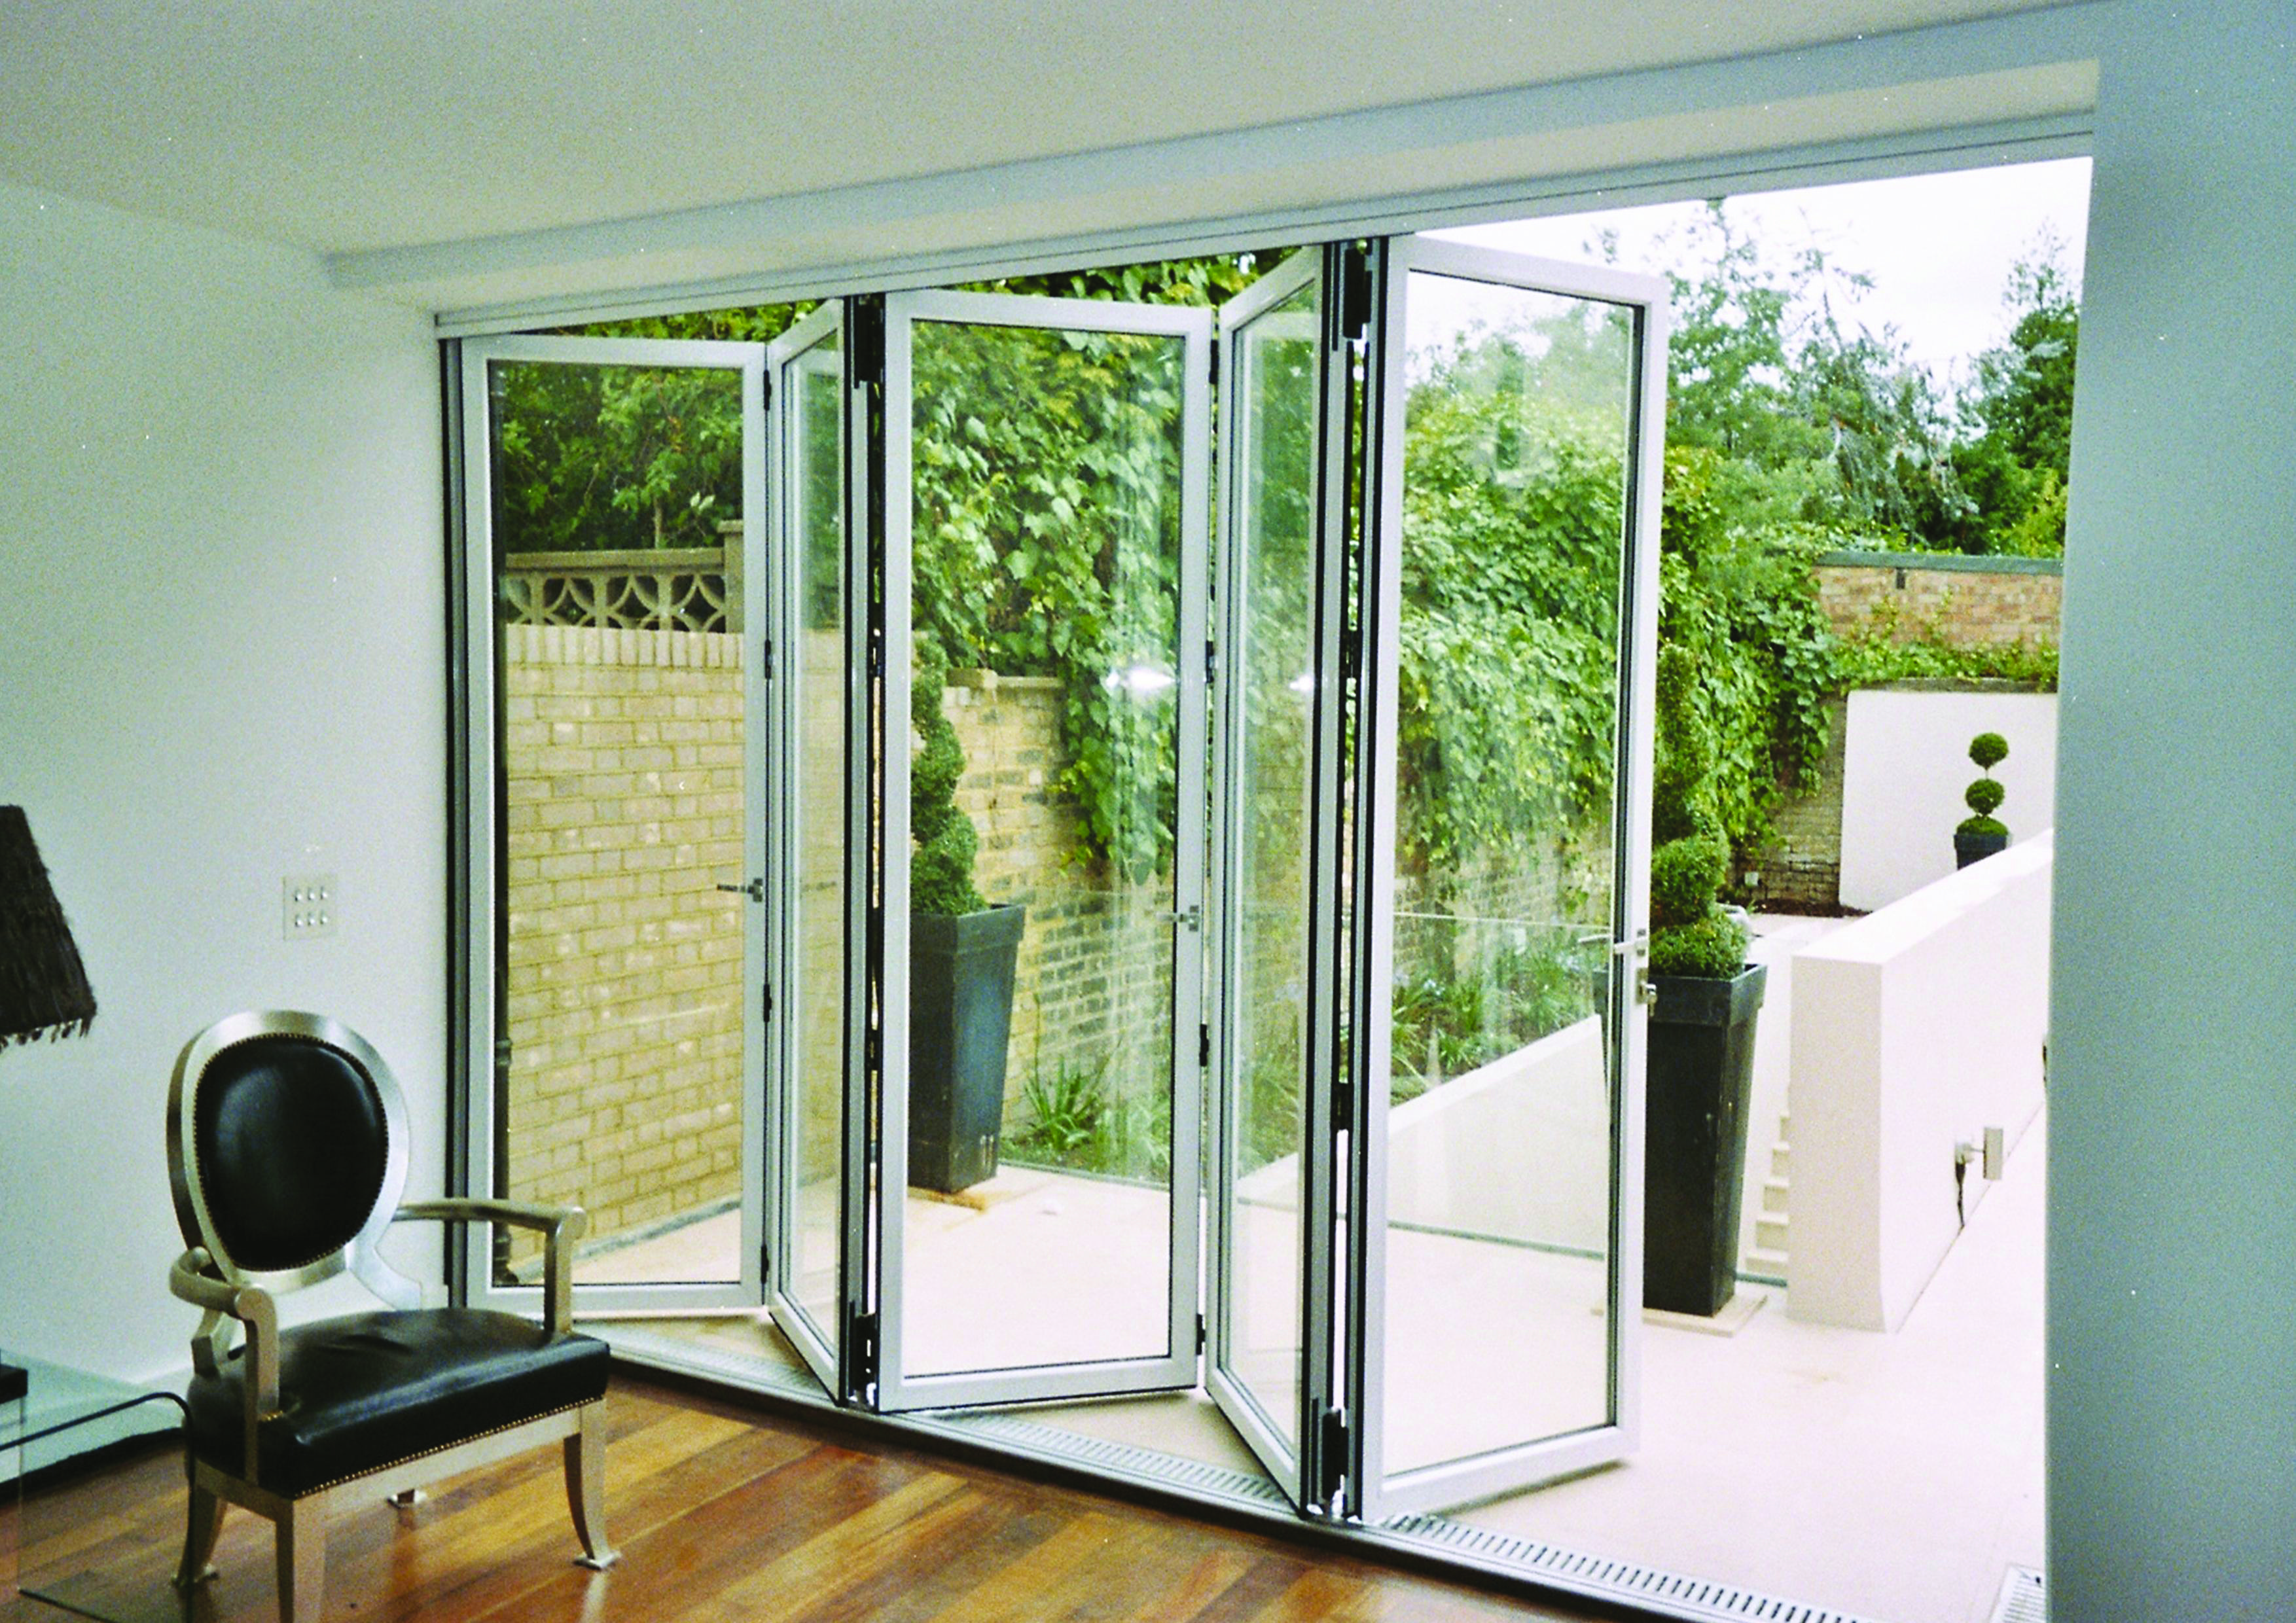 Folding Sliding Door Comar 7p I Fsd 4 Patio Doors Sliding Glass Doors Patio Folding Patio Doors